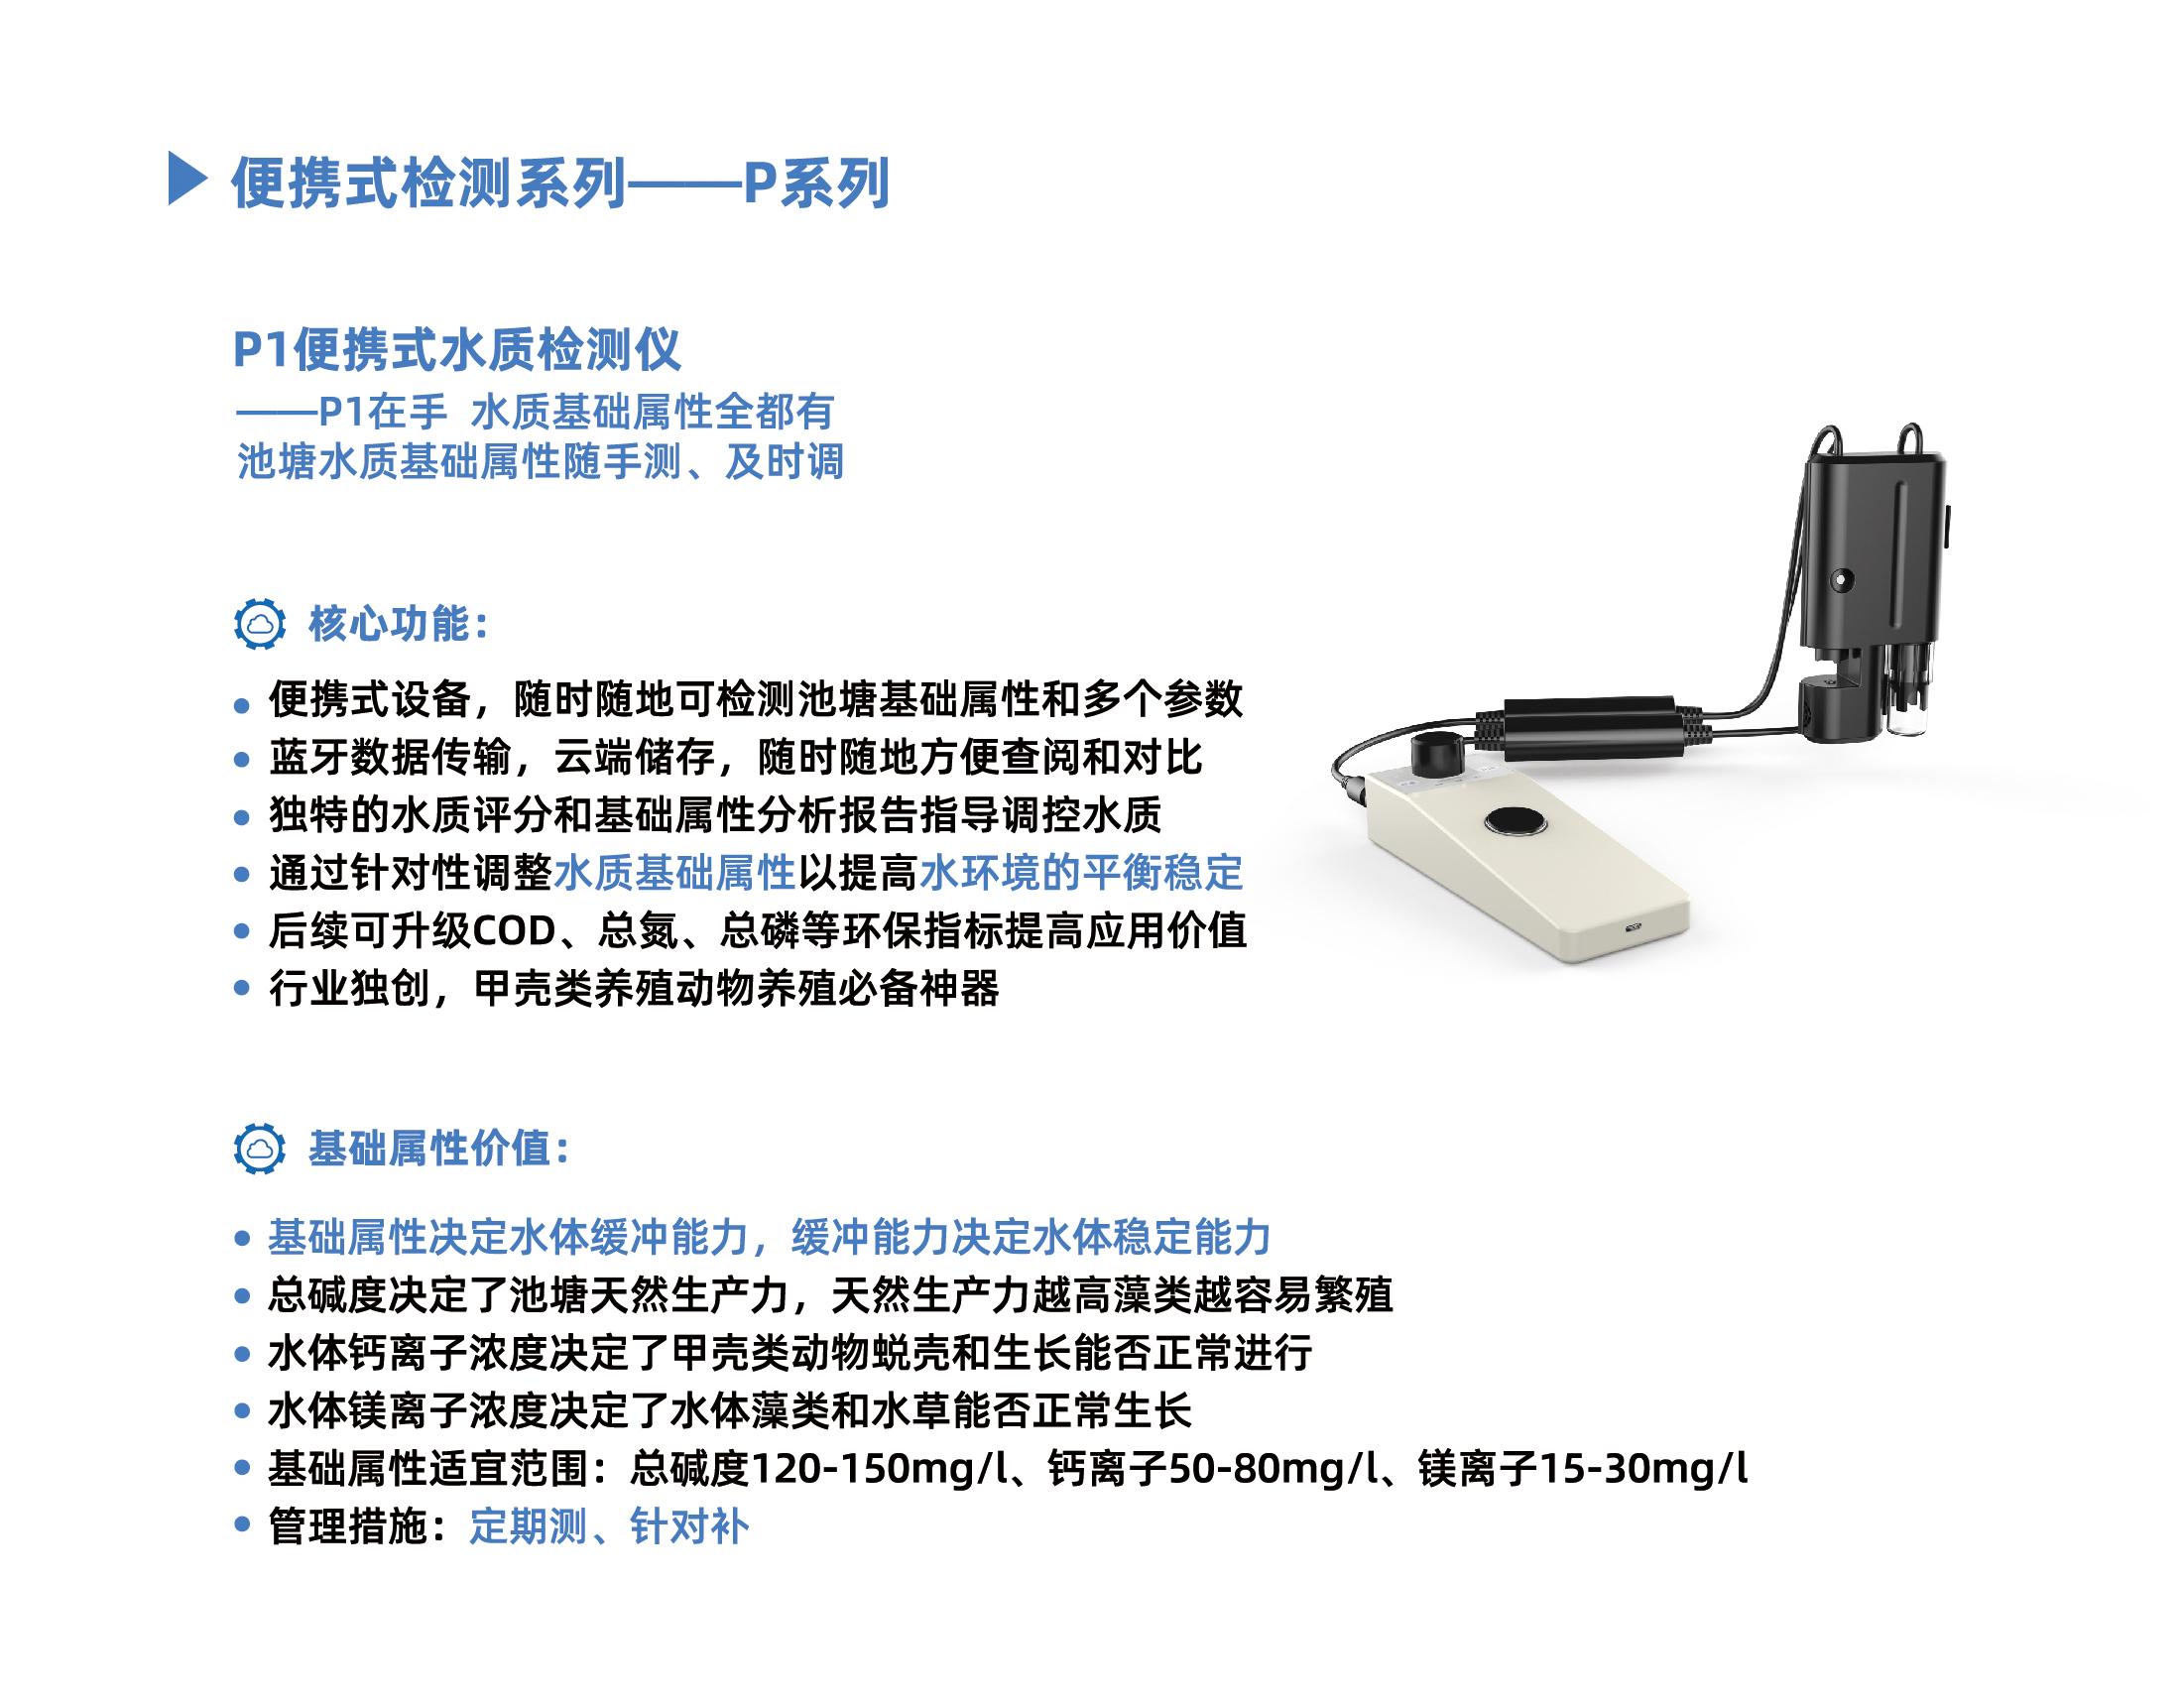 P1便携式水质检测仪